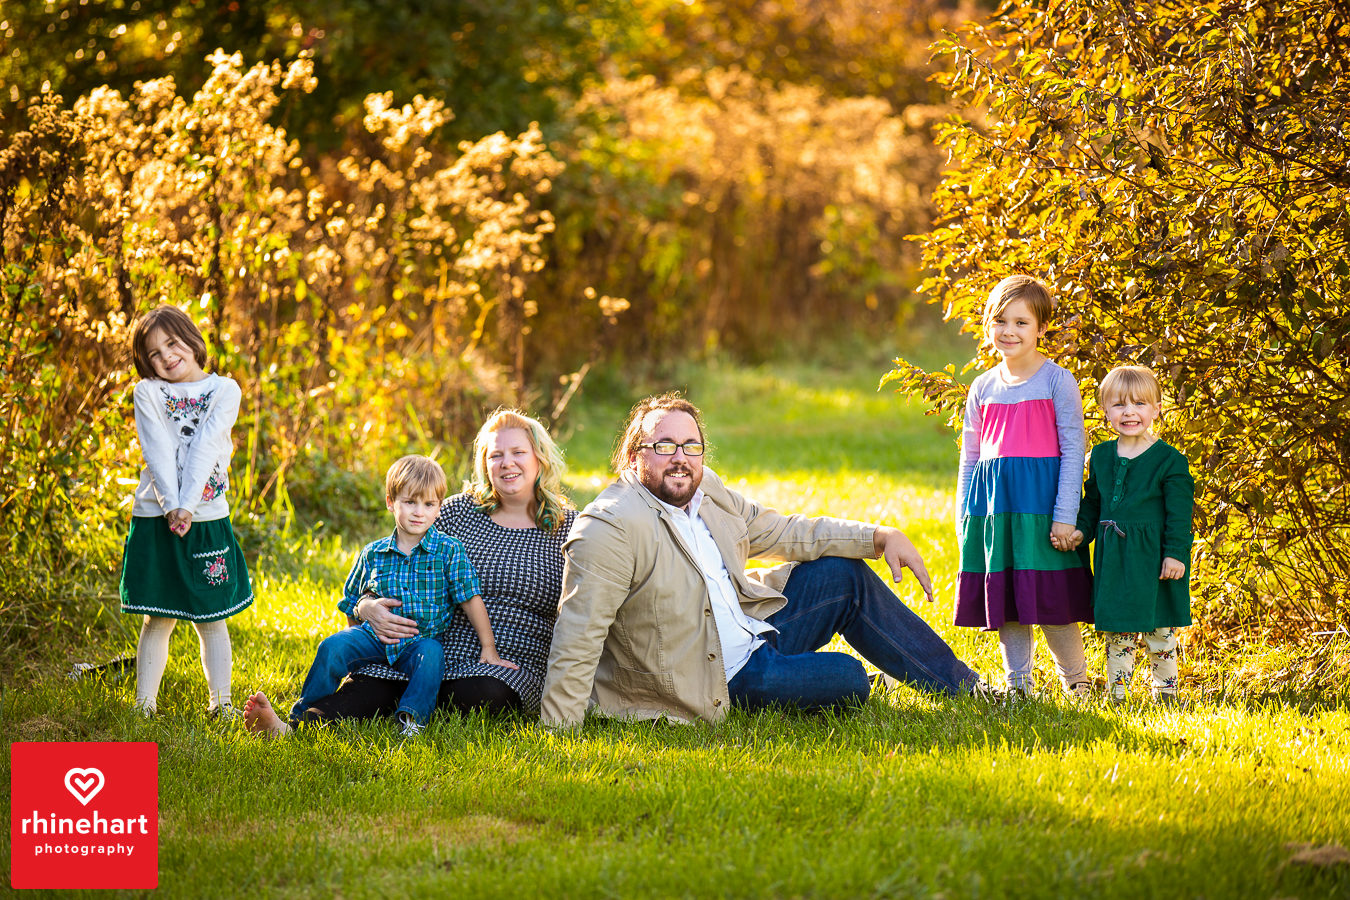 central-pa-pennsylvania-family-portrait-photographers-creative-unique-vibrant-colorful-2